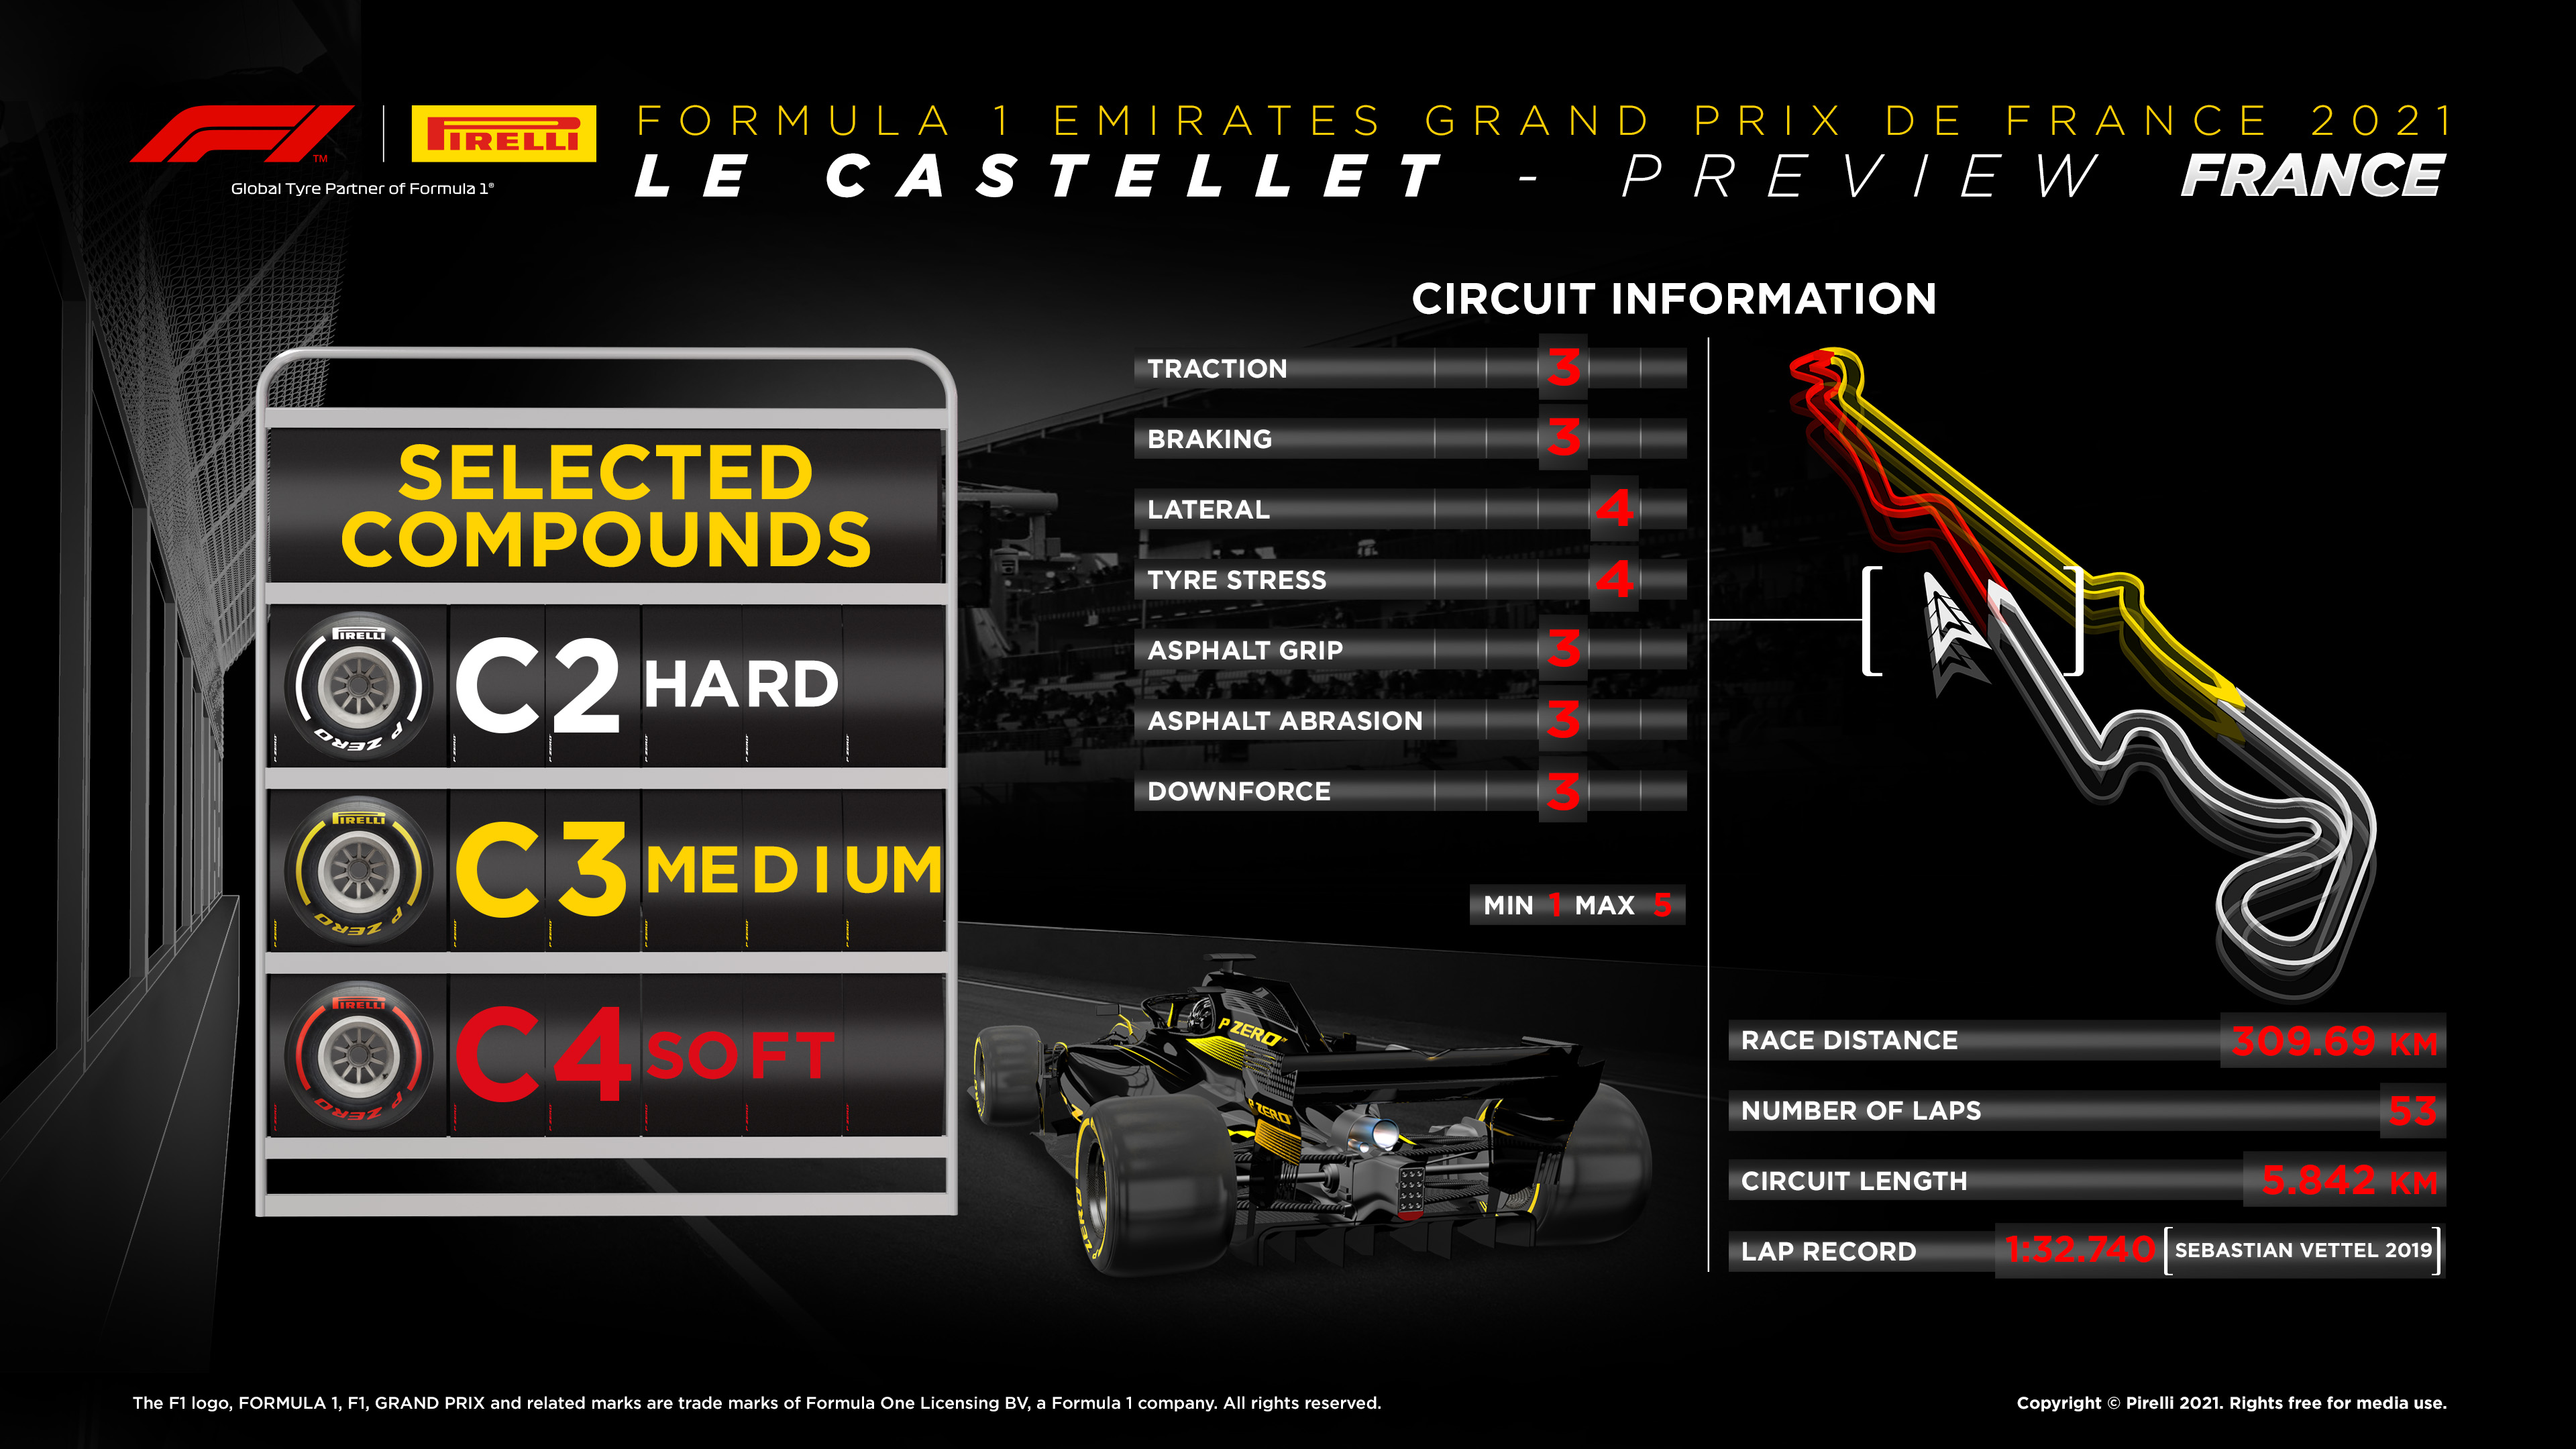 pirelli-infografia-gp-francia-2021-soymotor.jpg